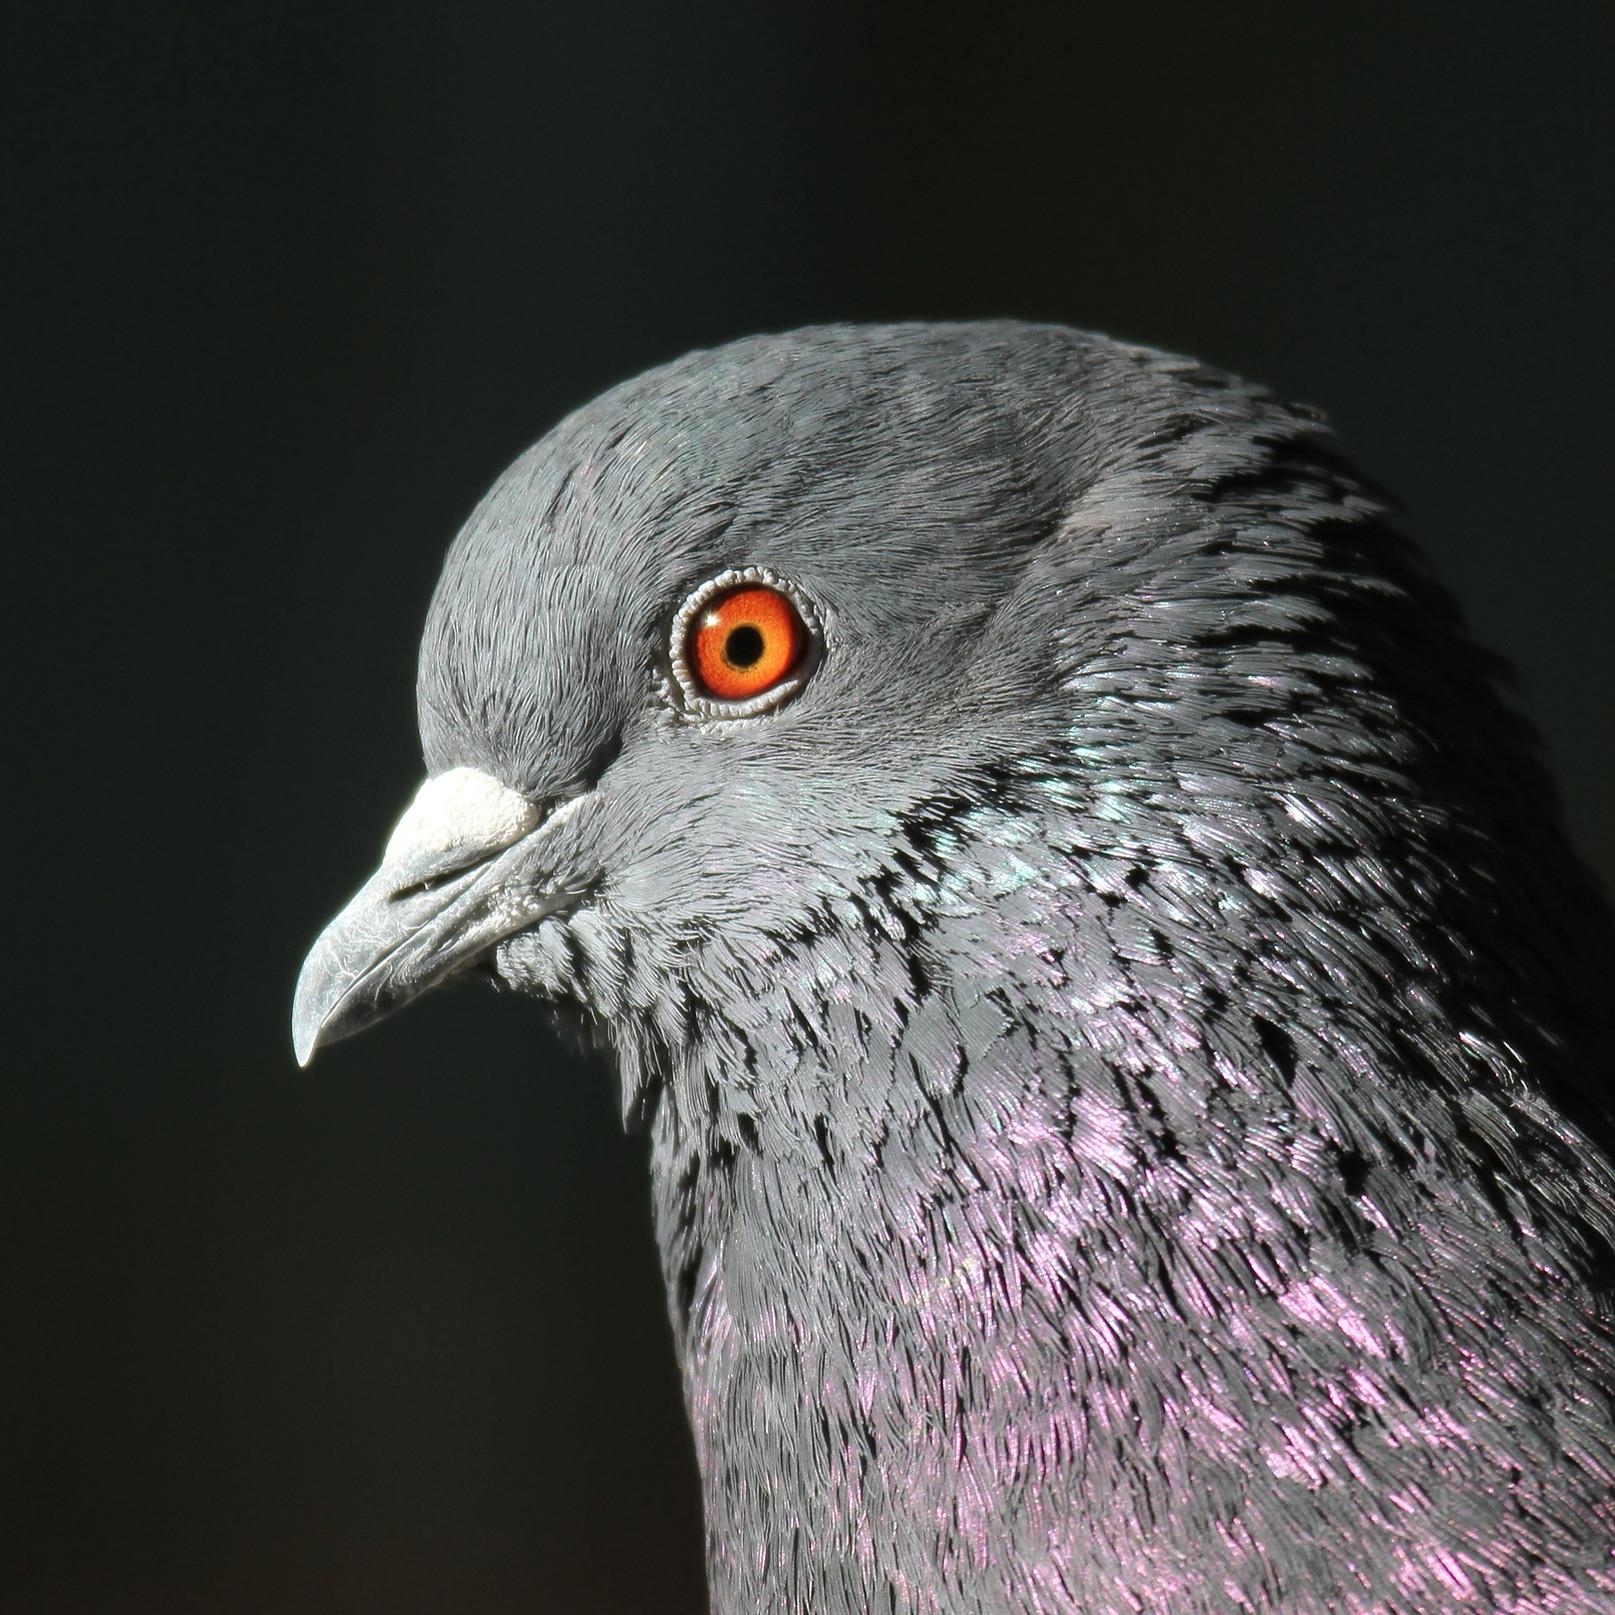 Pigeon Up Close